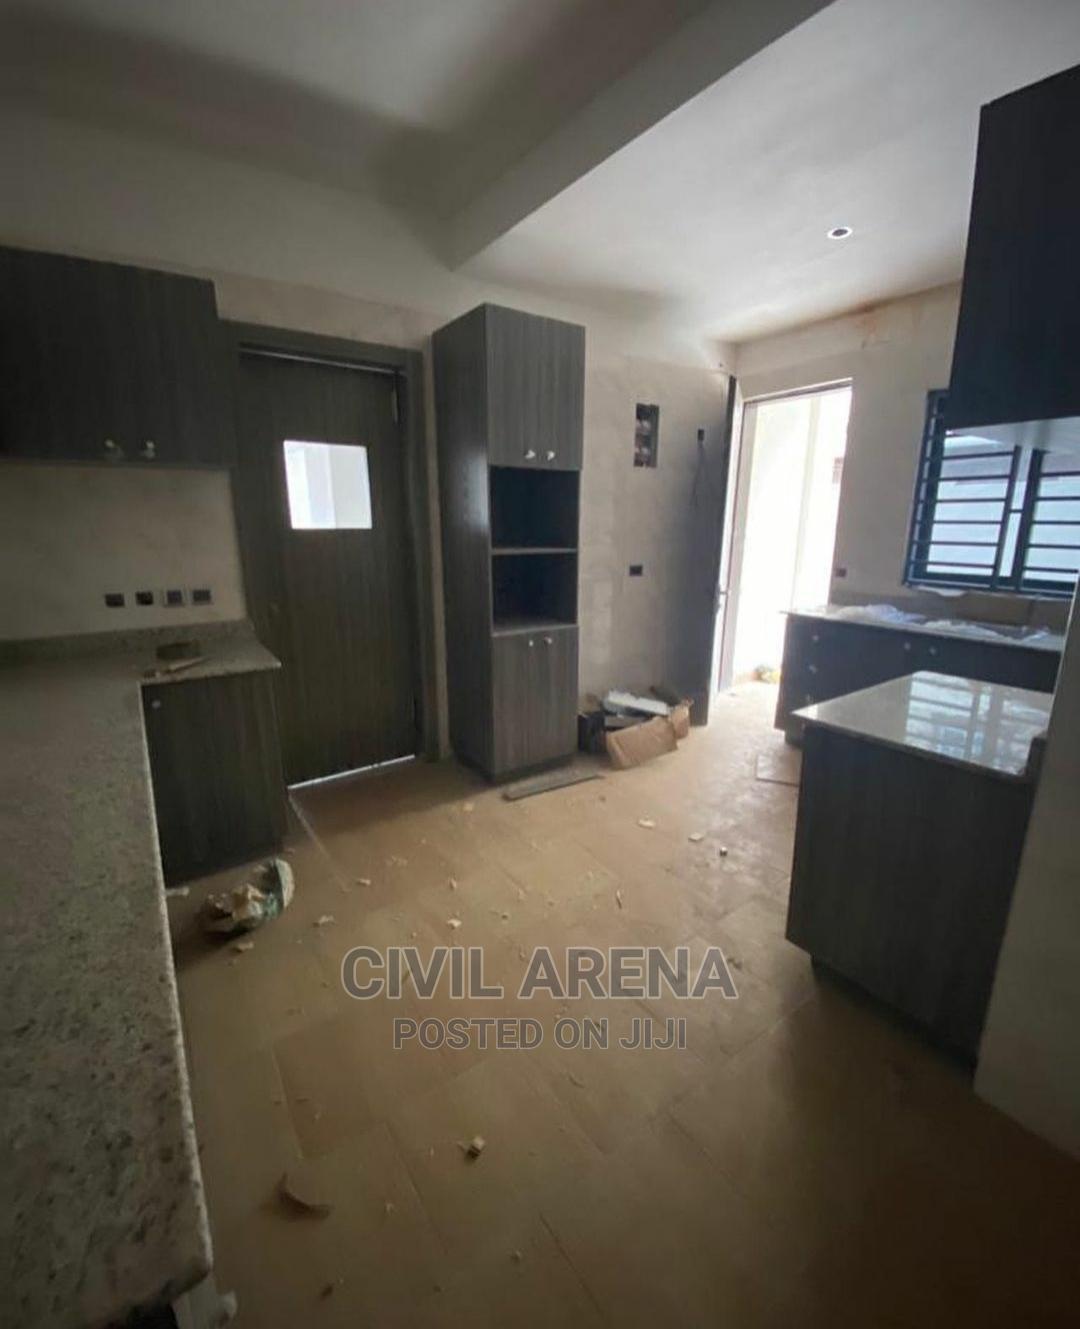 4 Bedroom Duplex for Sale at Lekki Phase 1 | Houses & Apartments For Sale for sale in Lekki Phase 1, Lekki, Nigeria